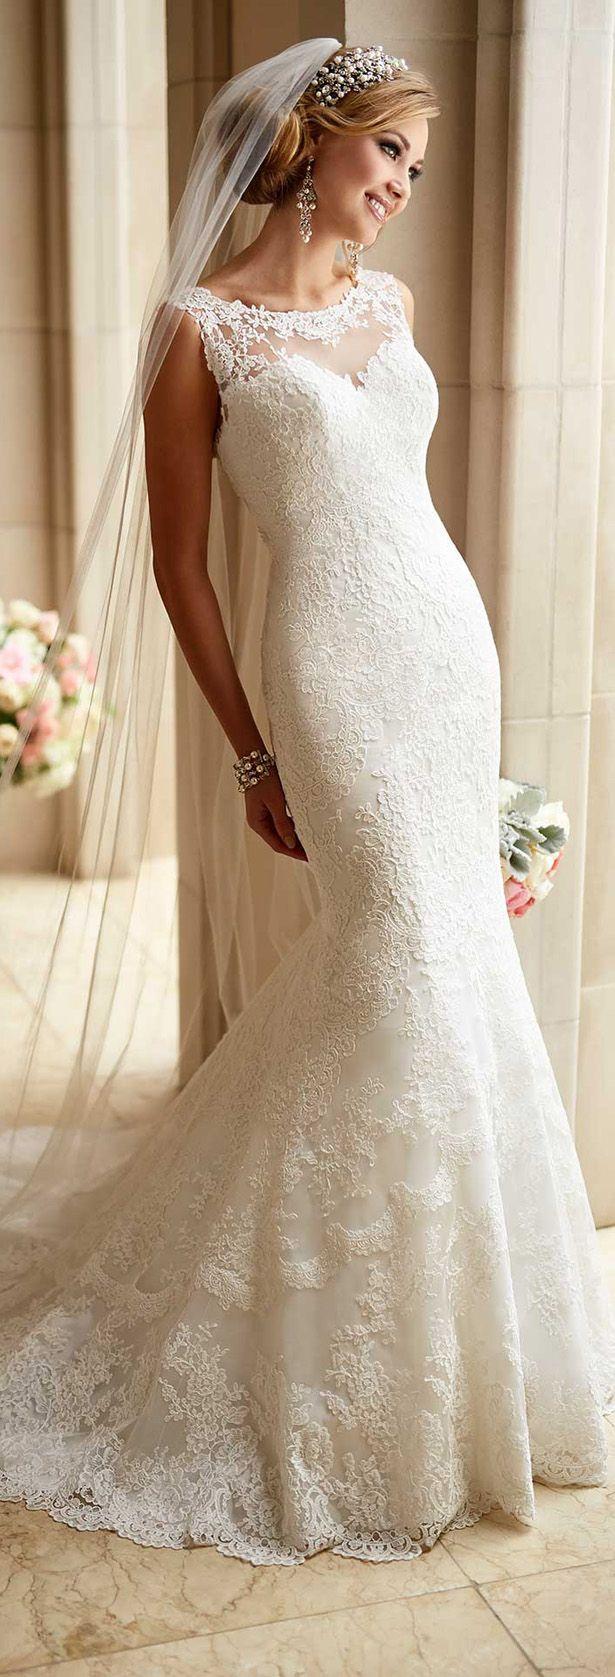 Wedding-Dresses-1534